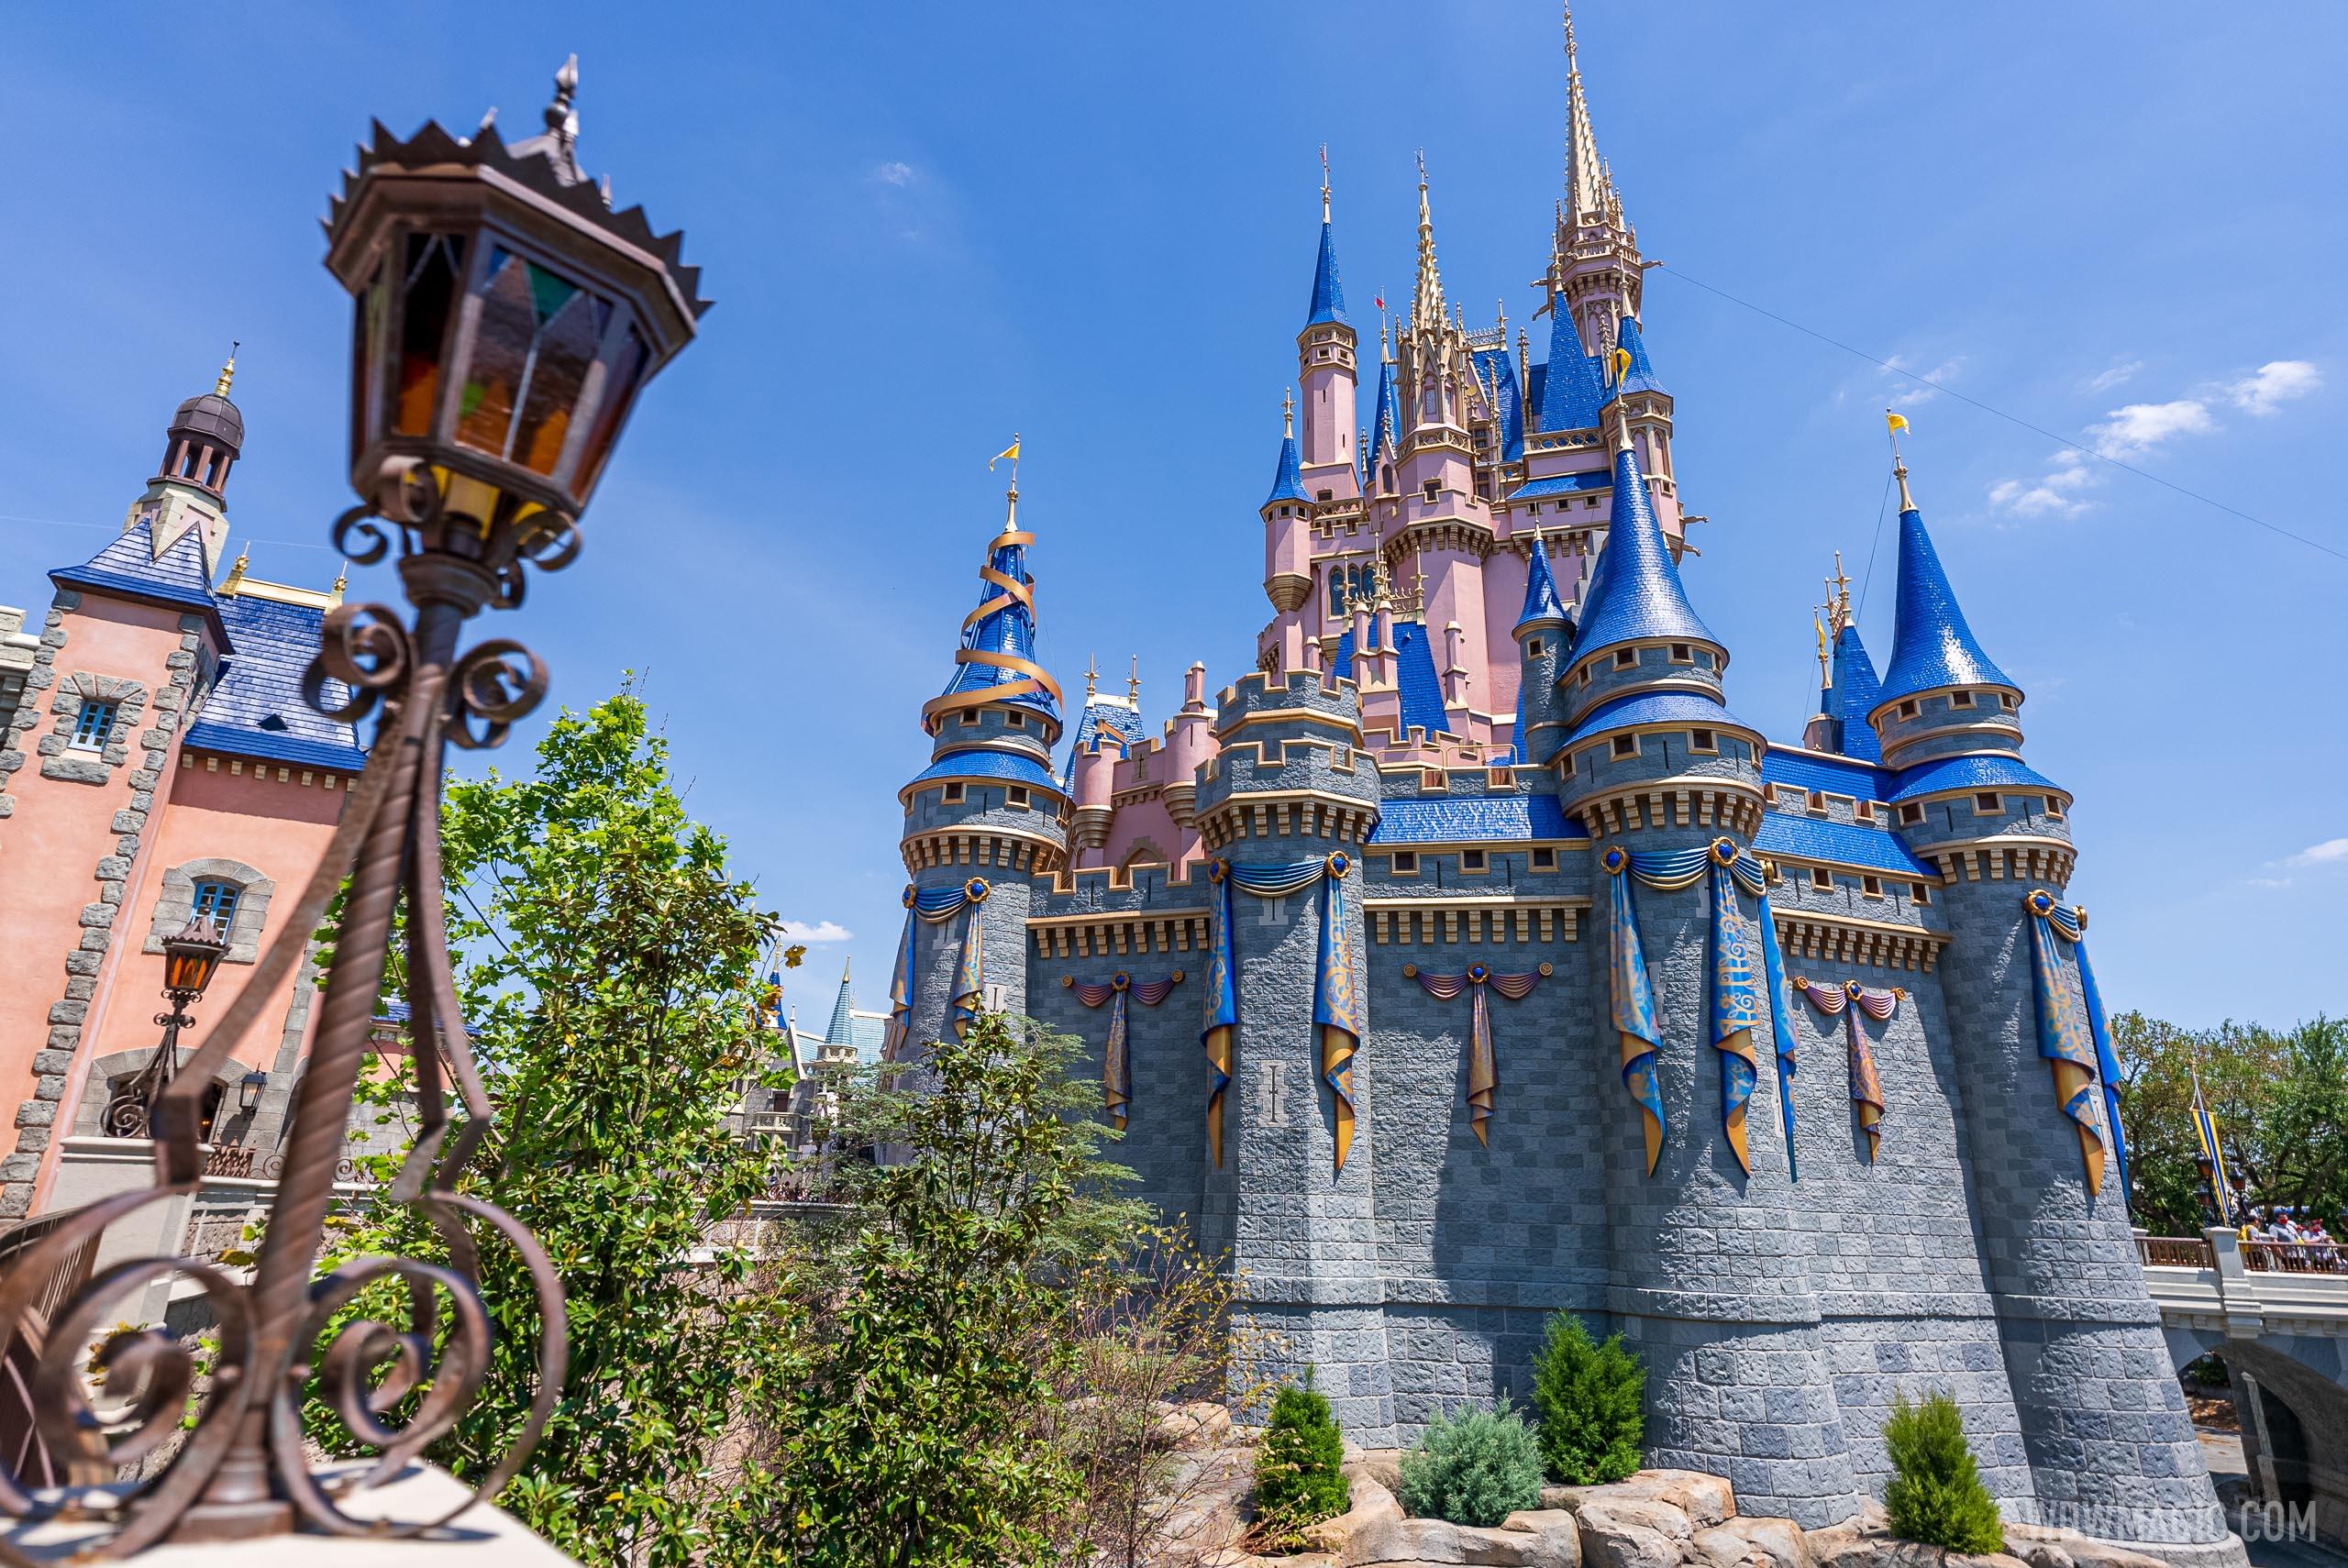 Cinderella-Castle_Full_41627.jpg